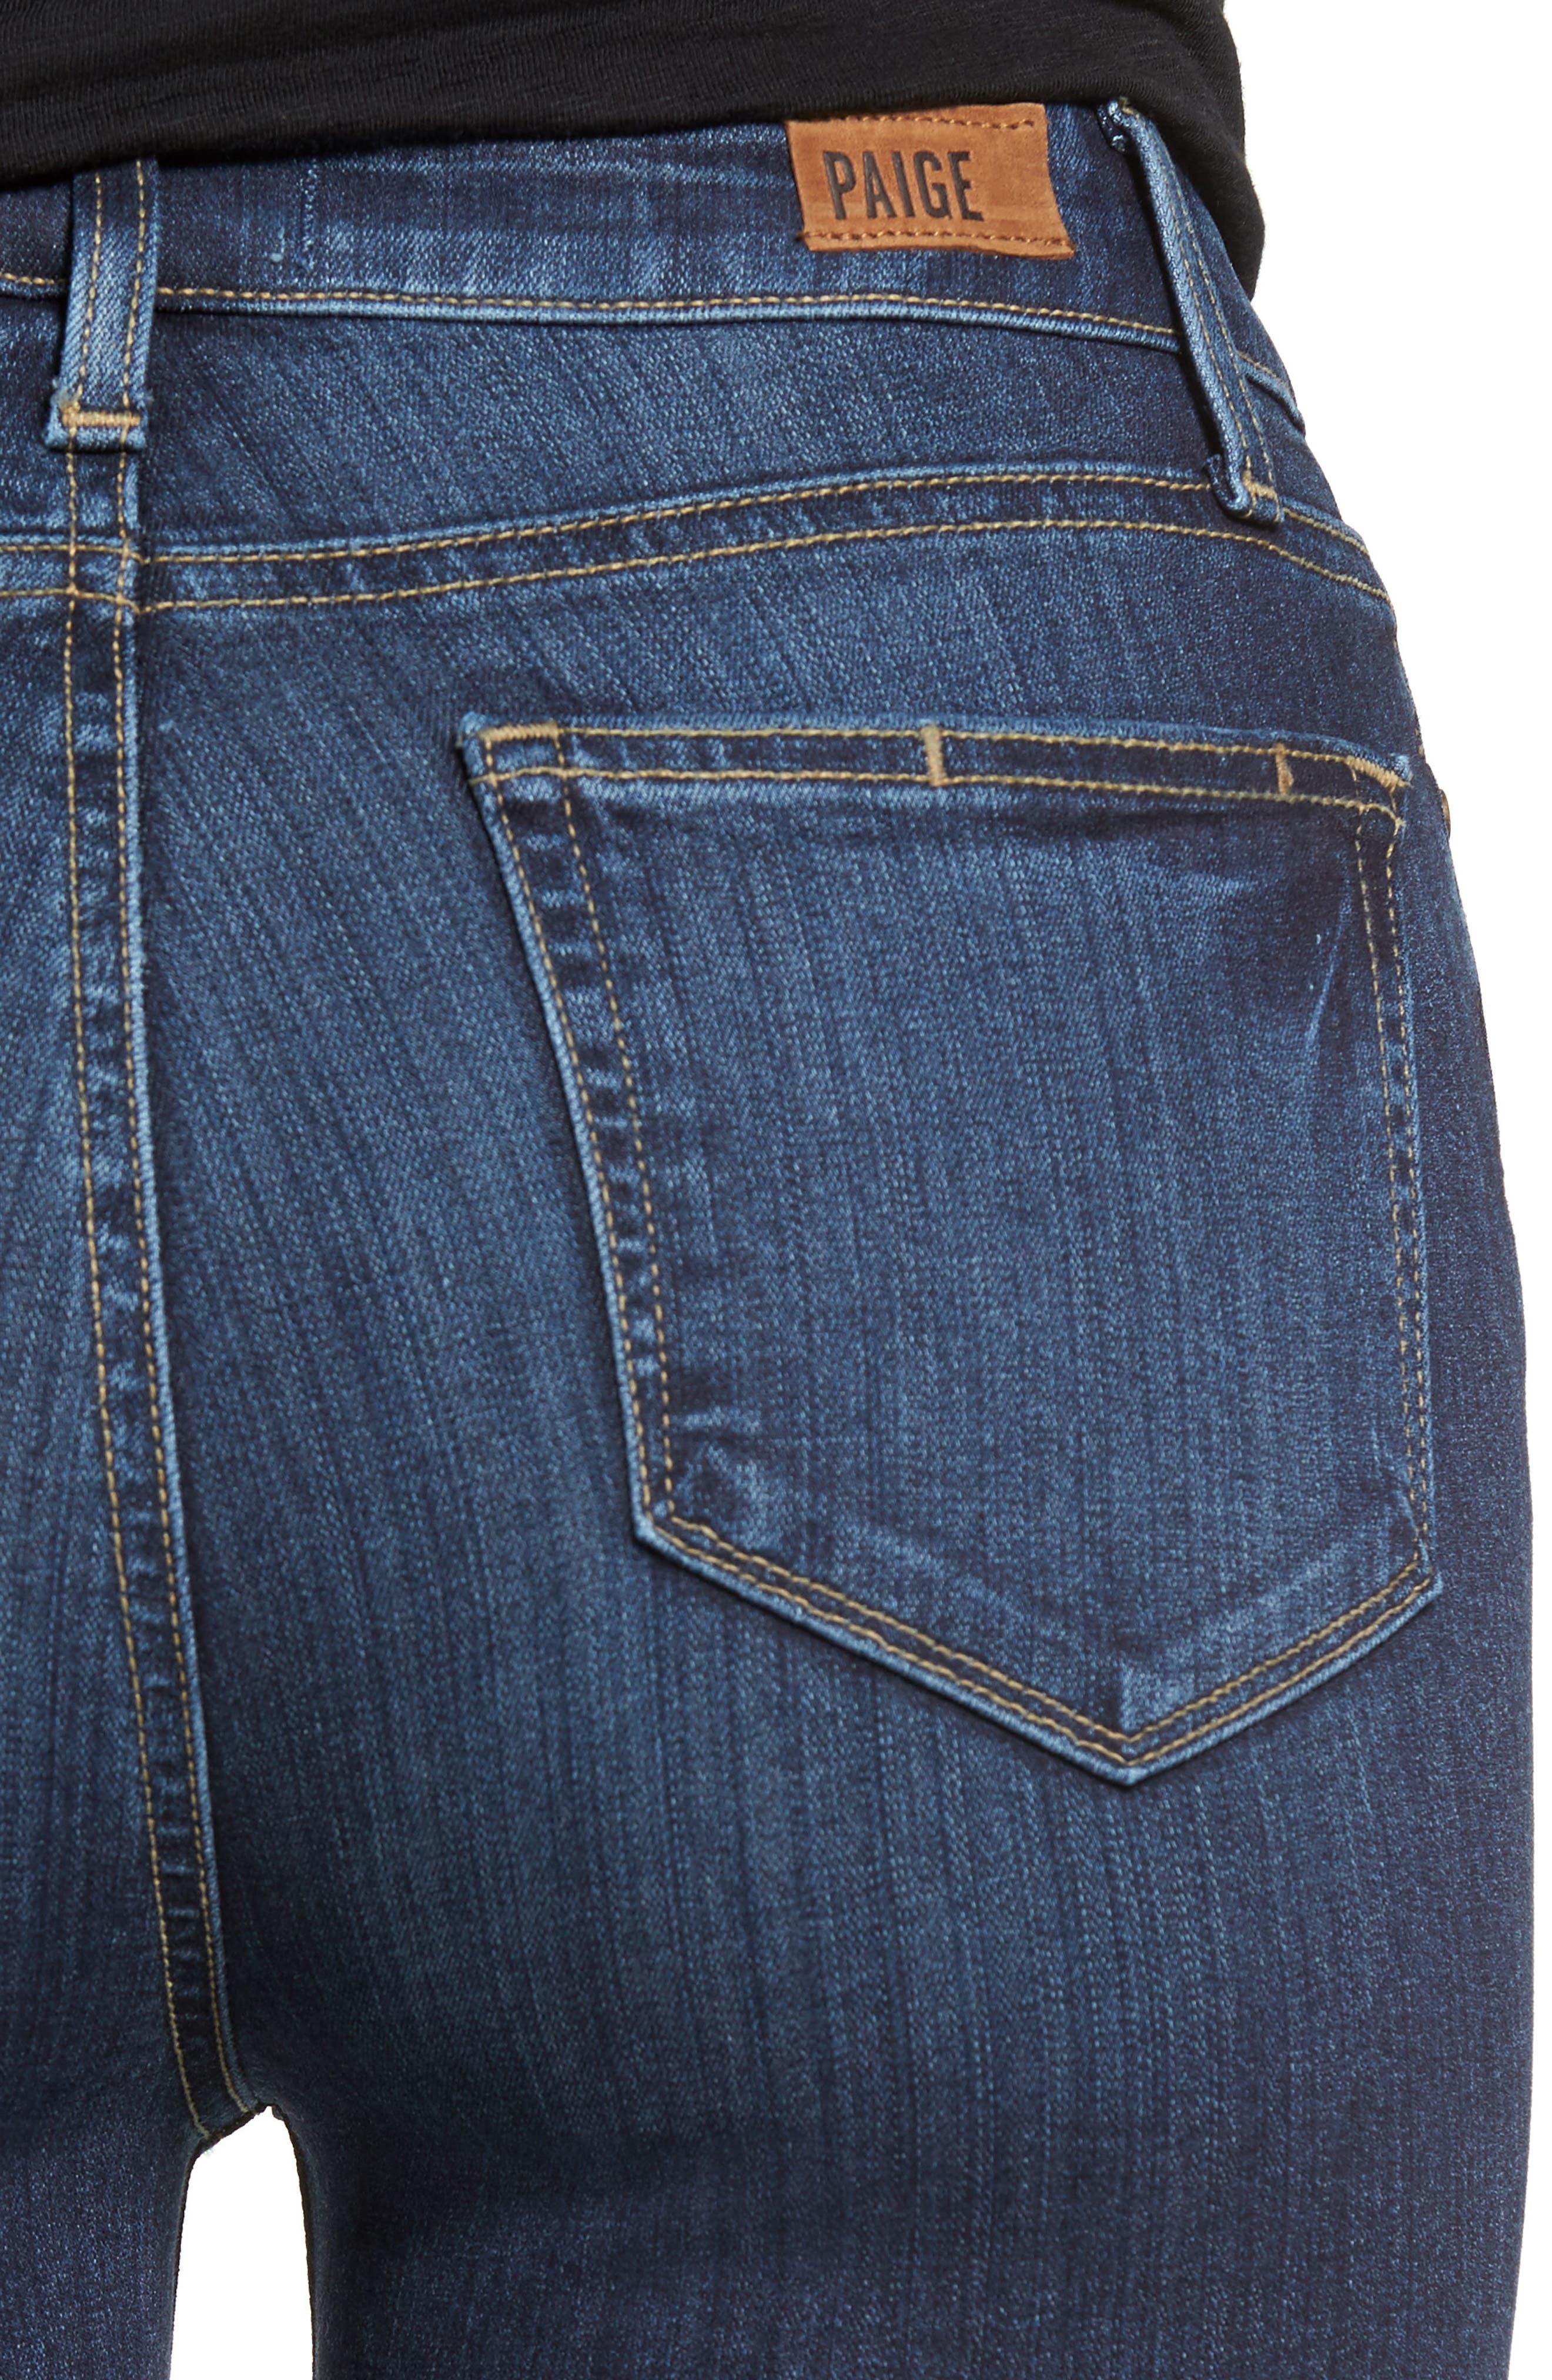 PAIGE, Hoxton High Waist Skinny Jeans, Alternate thumbnail 4, color, 400